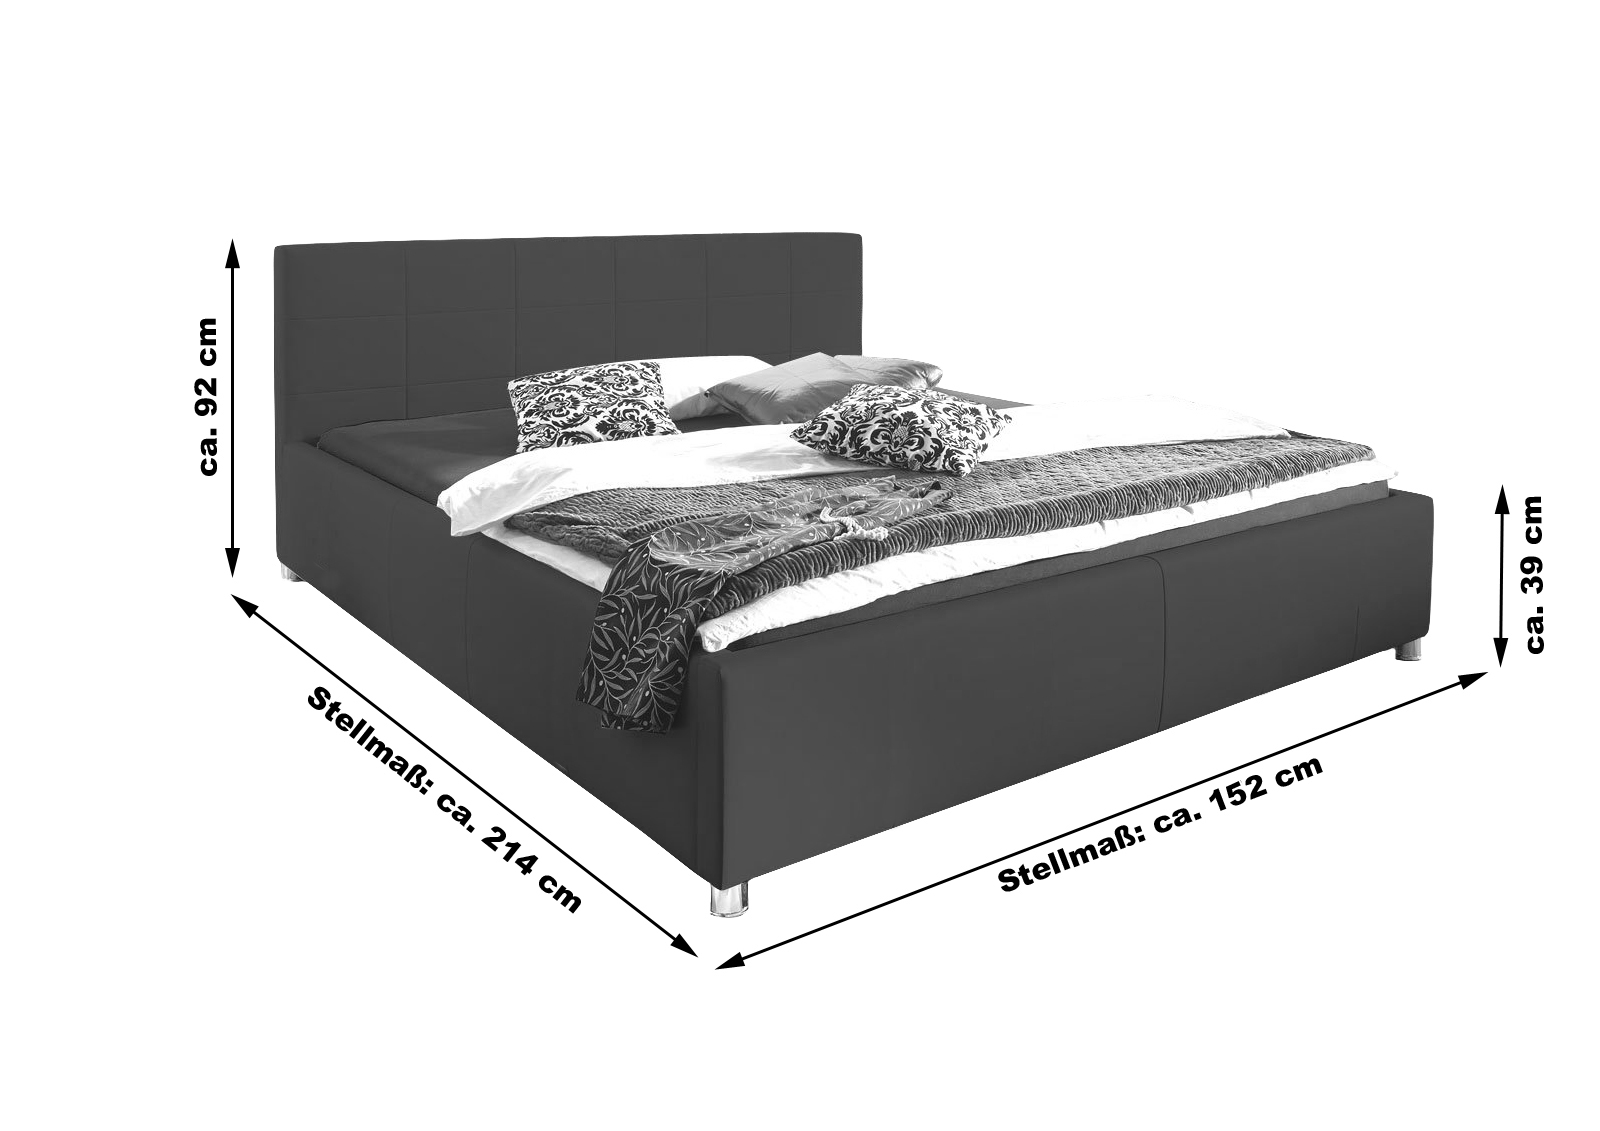 Doppelbett weiß  SAM® Bett Polsterbett Doppelbett weiß 140 x 200 cm KIRA